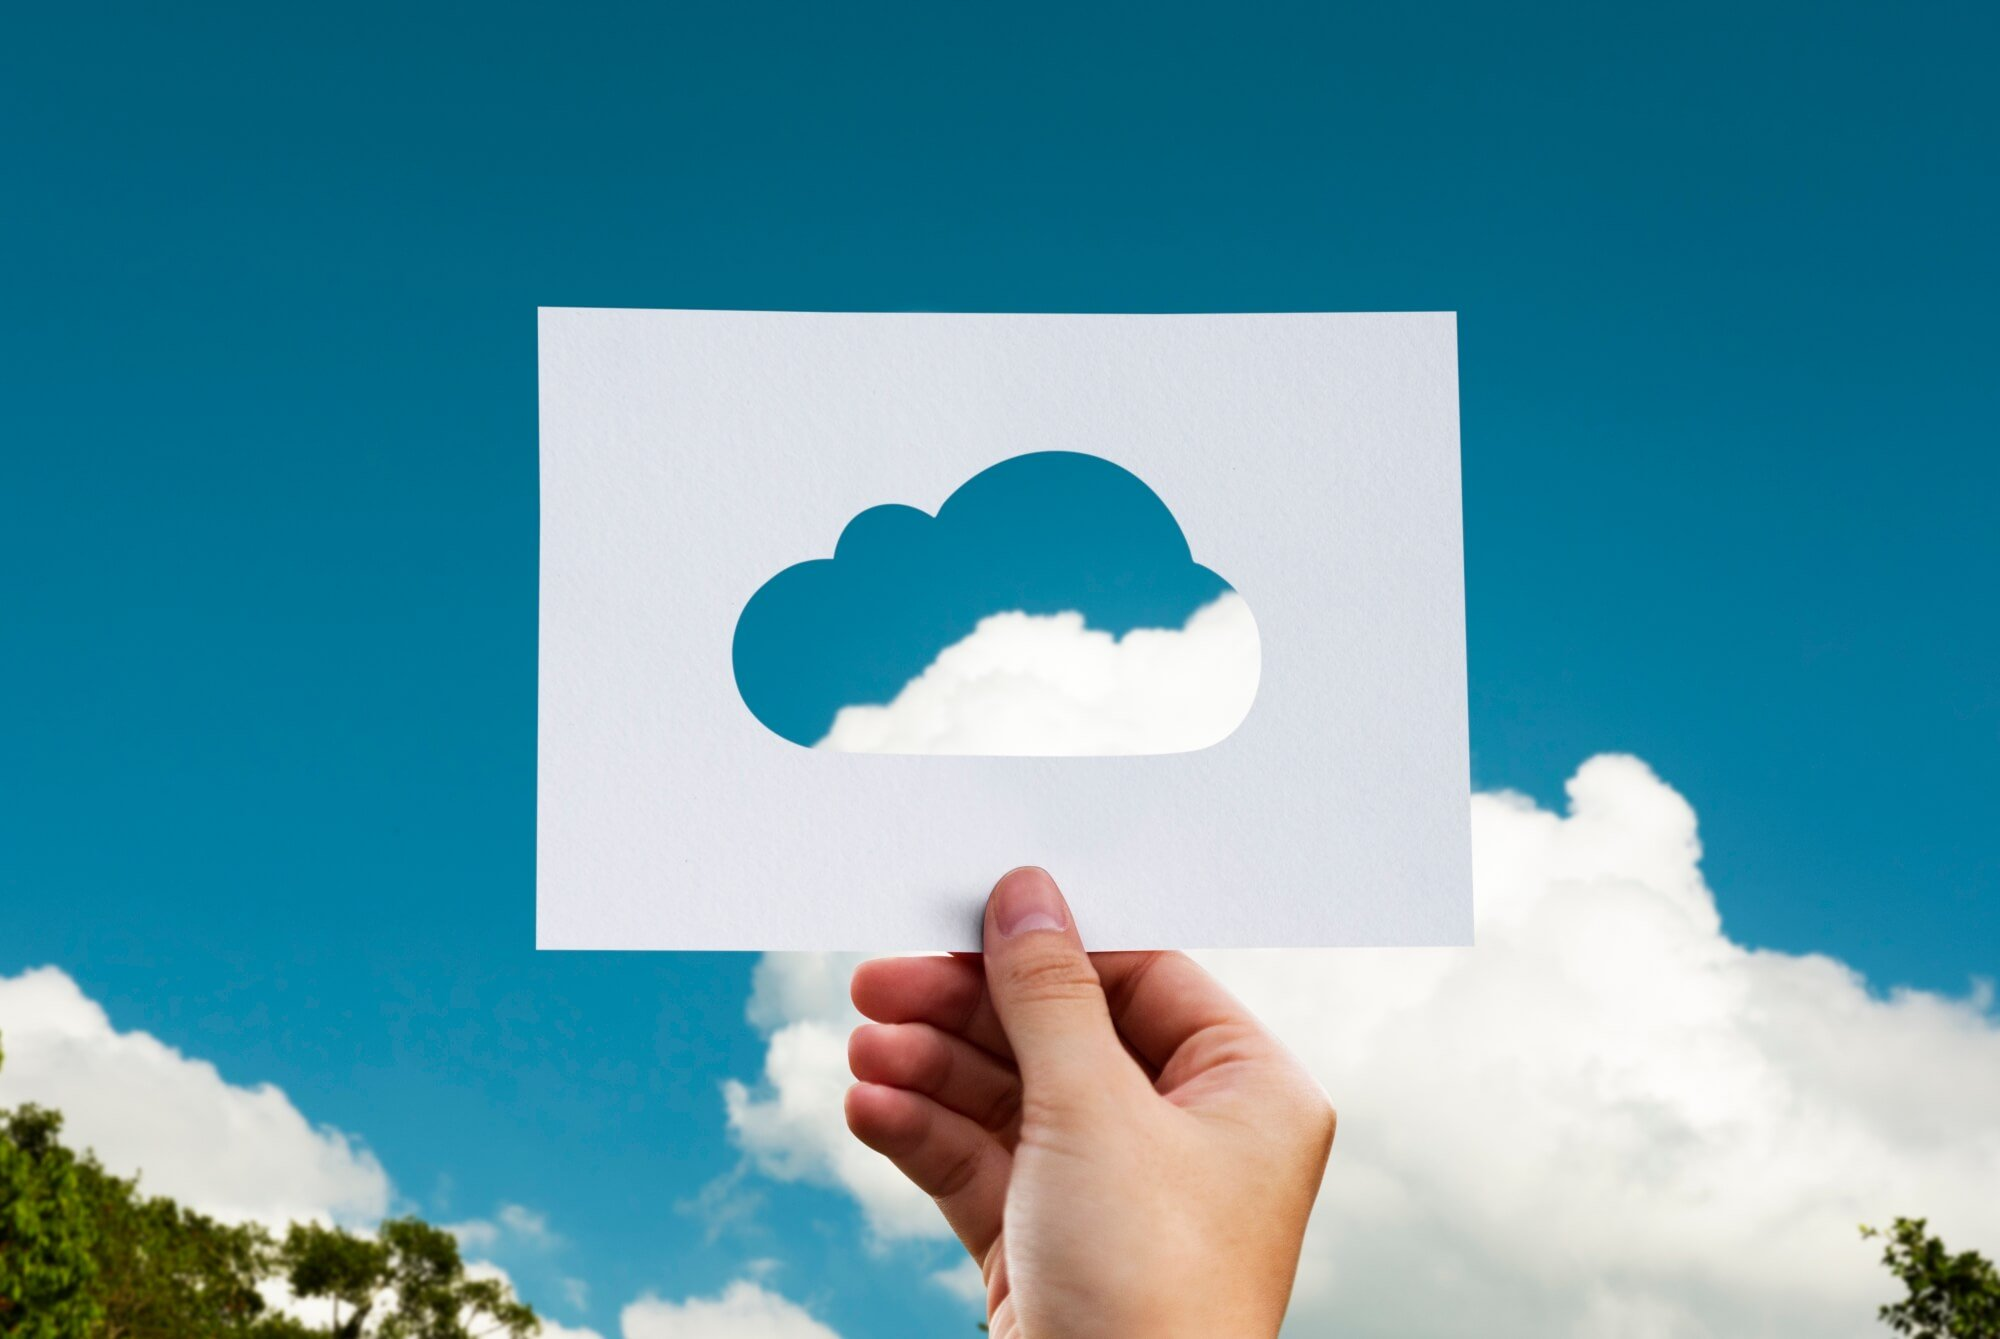 Platform-as-a-Service über die Cloud